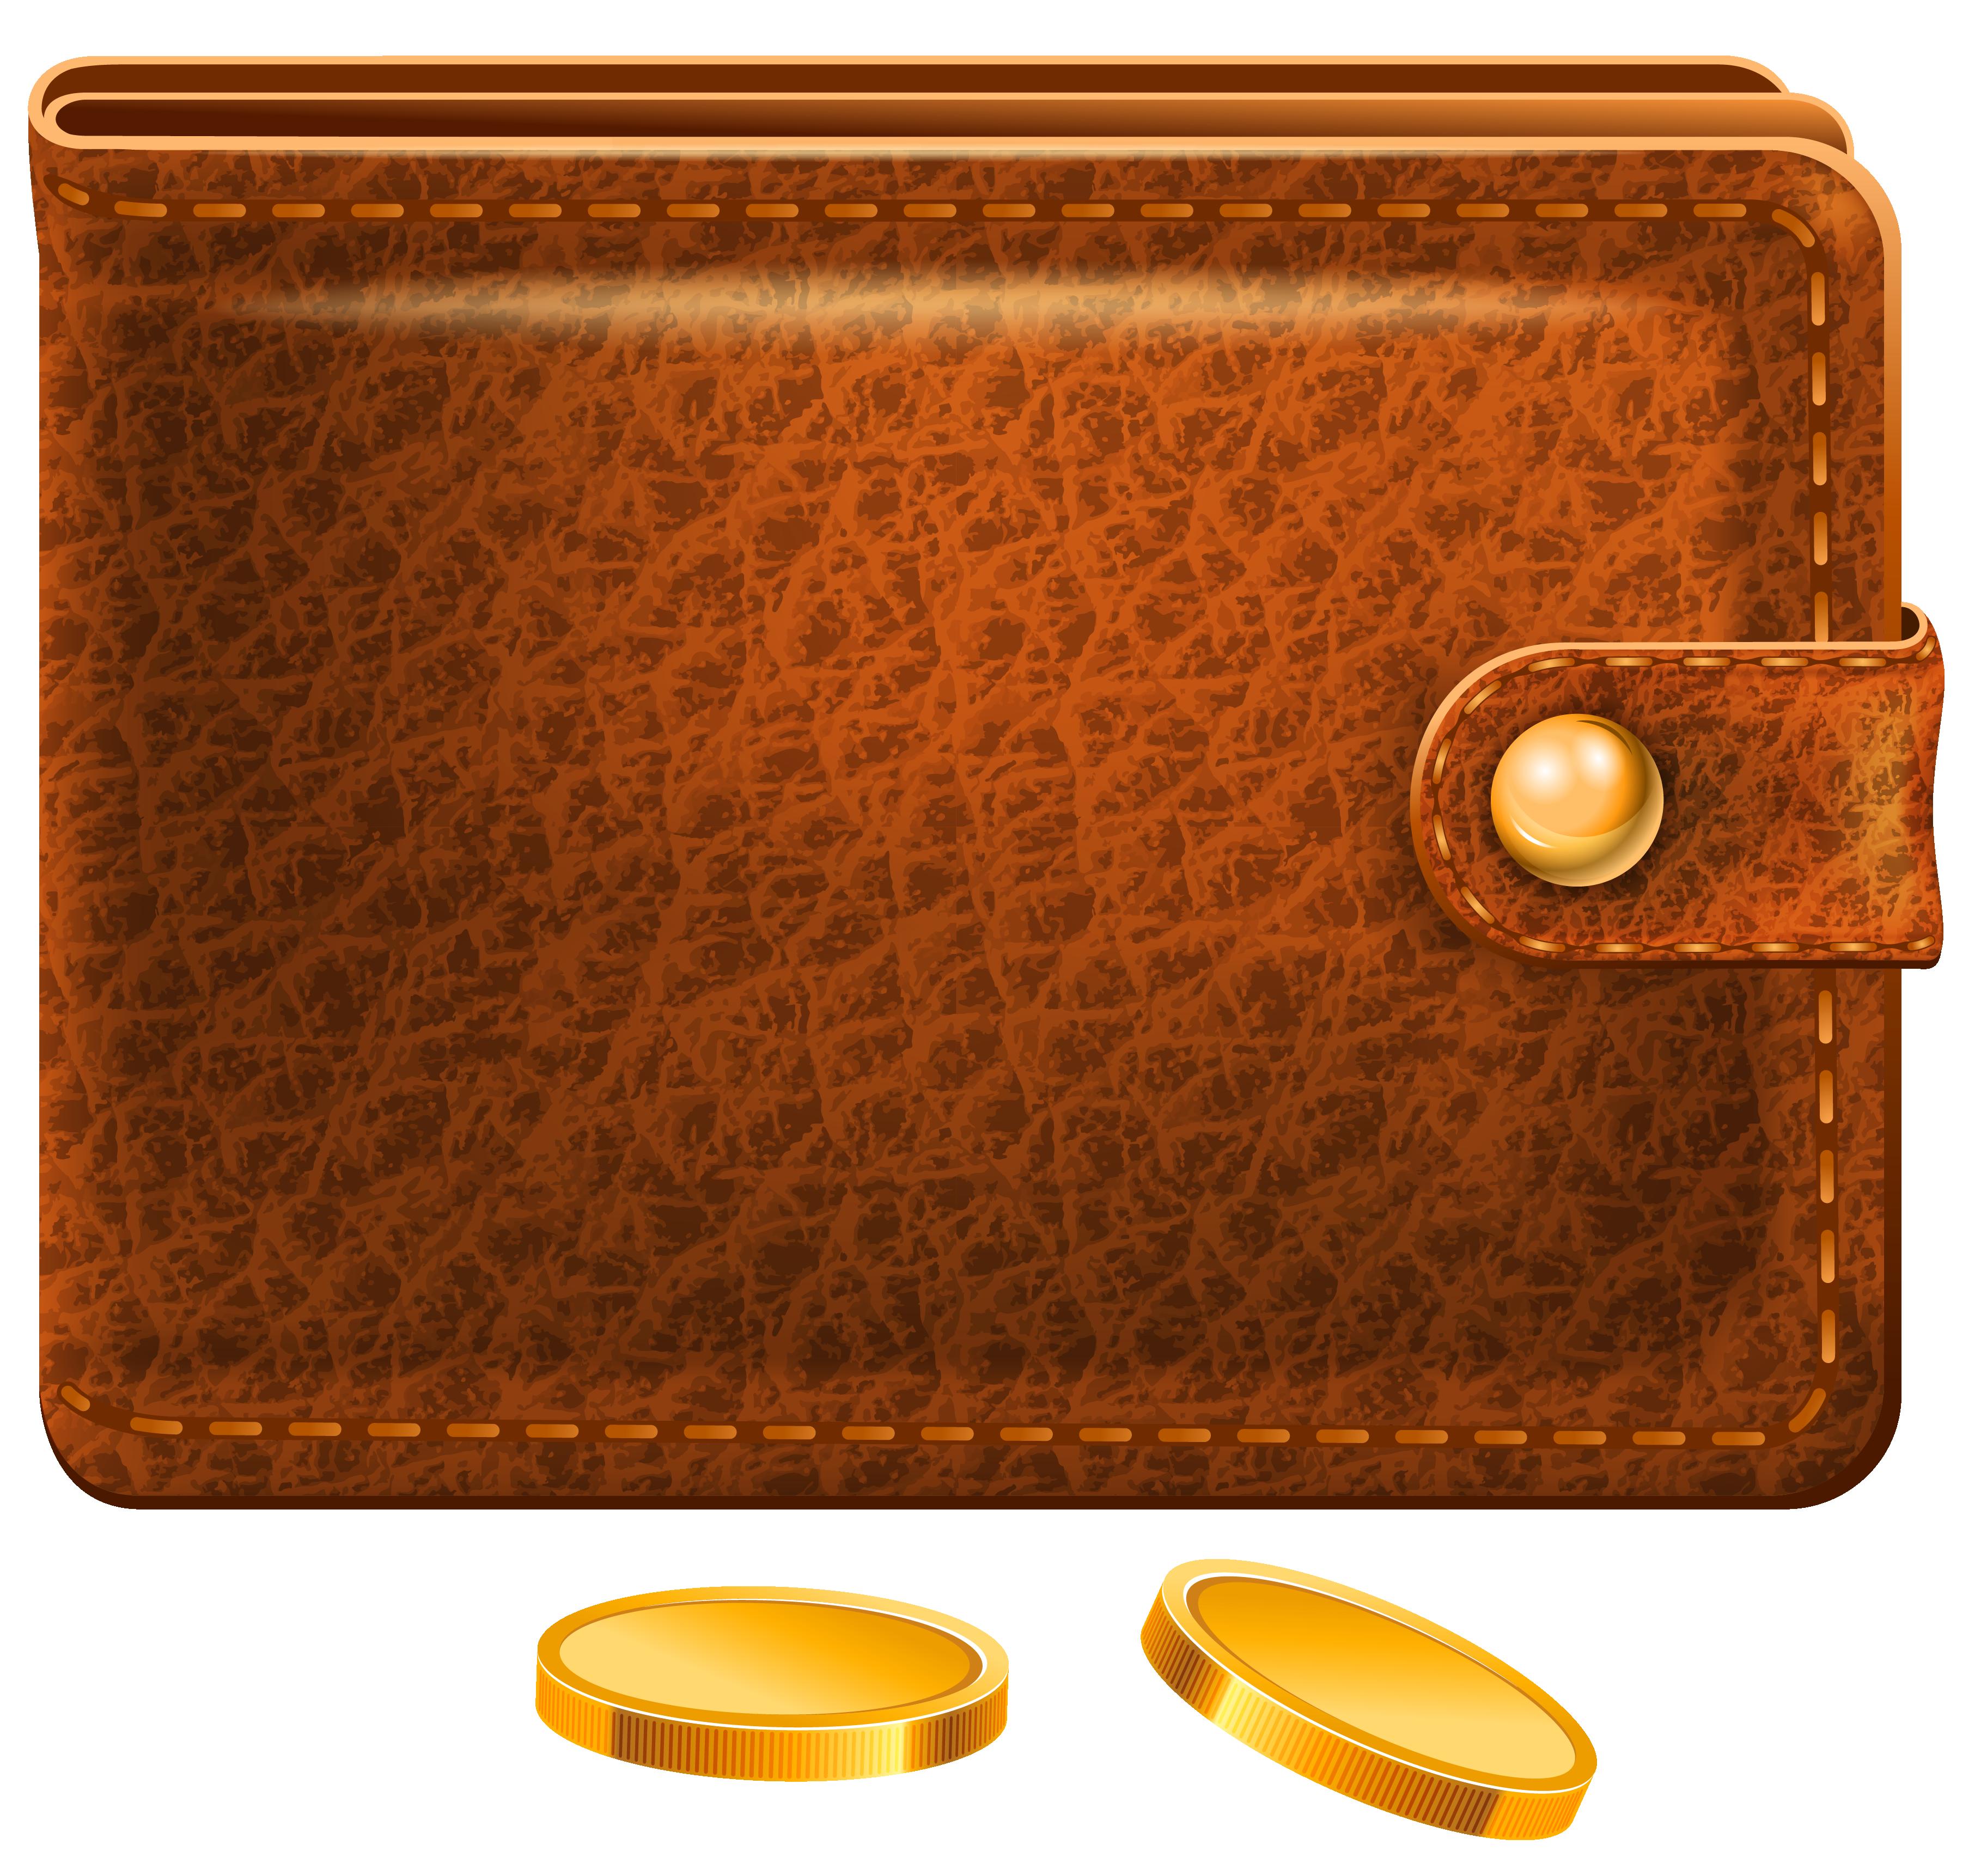 Wallet clipart leather wallet, Wallet leather wallet.